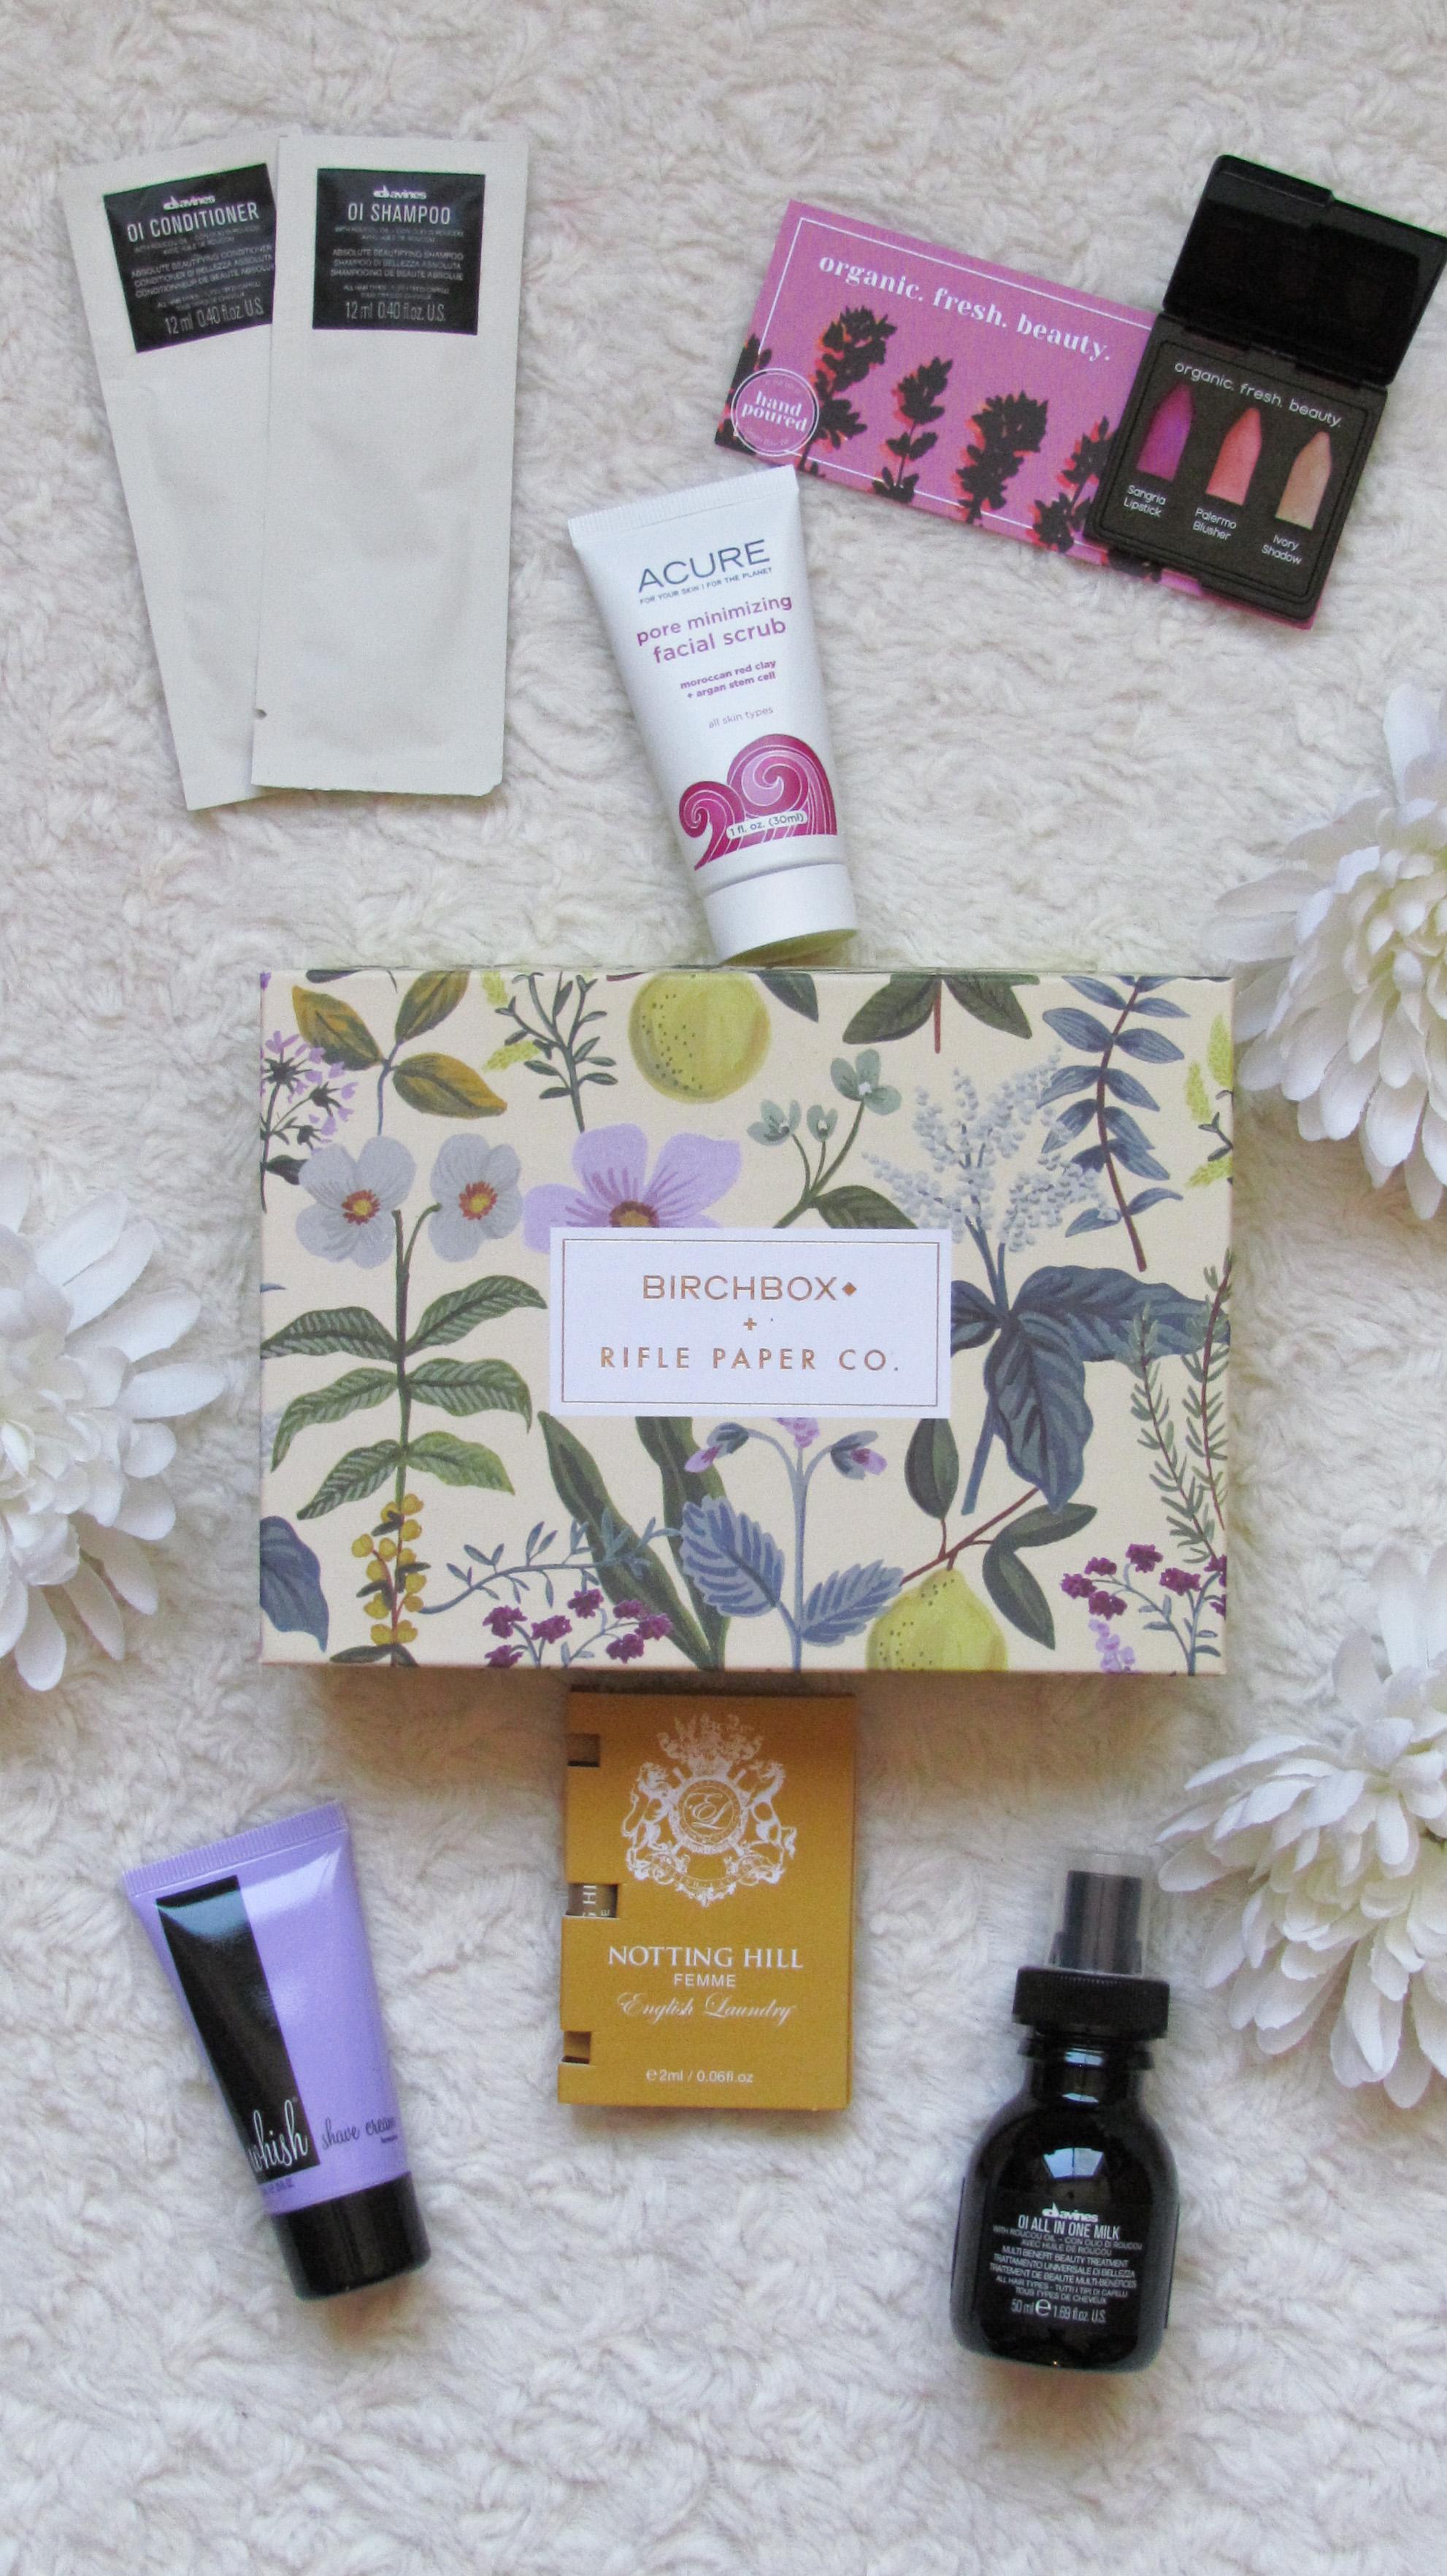 Birchbox - Davines Oi shampoo, conditioner, and hair milk, Au Naturale cosmetics trio set, Whish shave cream, English Laundry Notting Hill Femme Fragrance, Acure Organics pore minimizing facial scrub